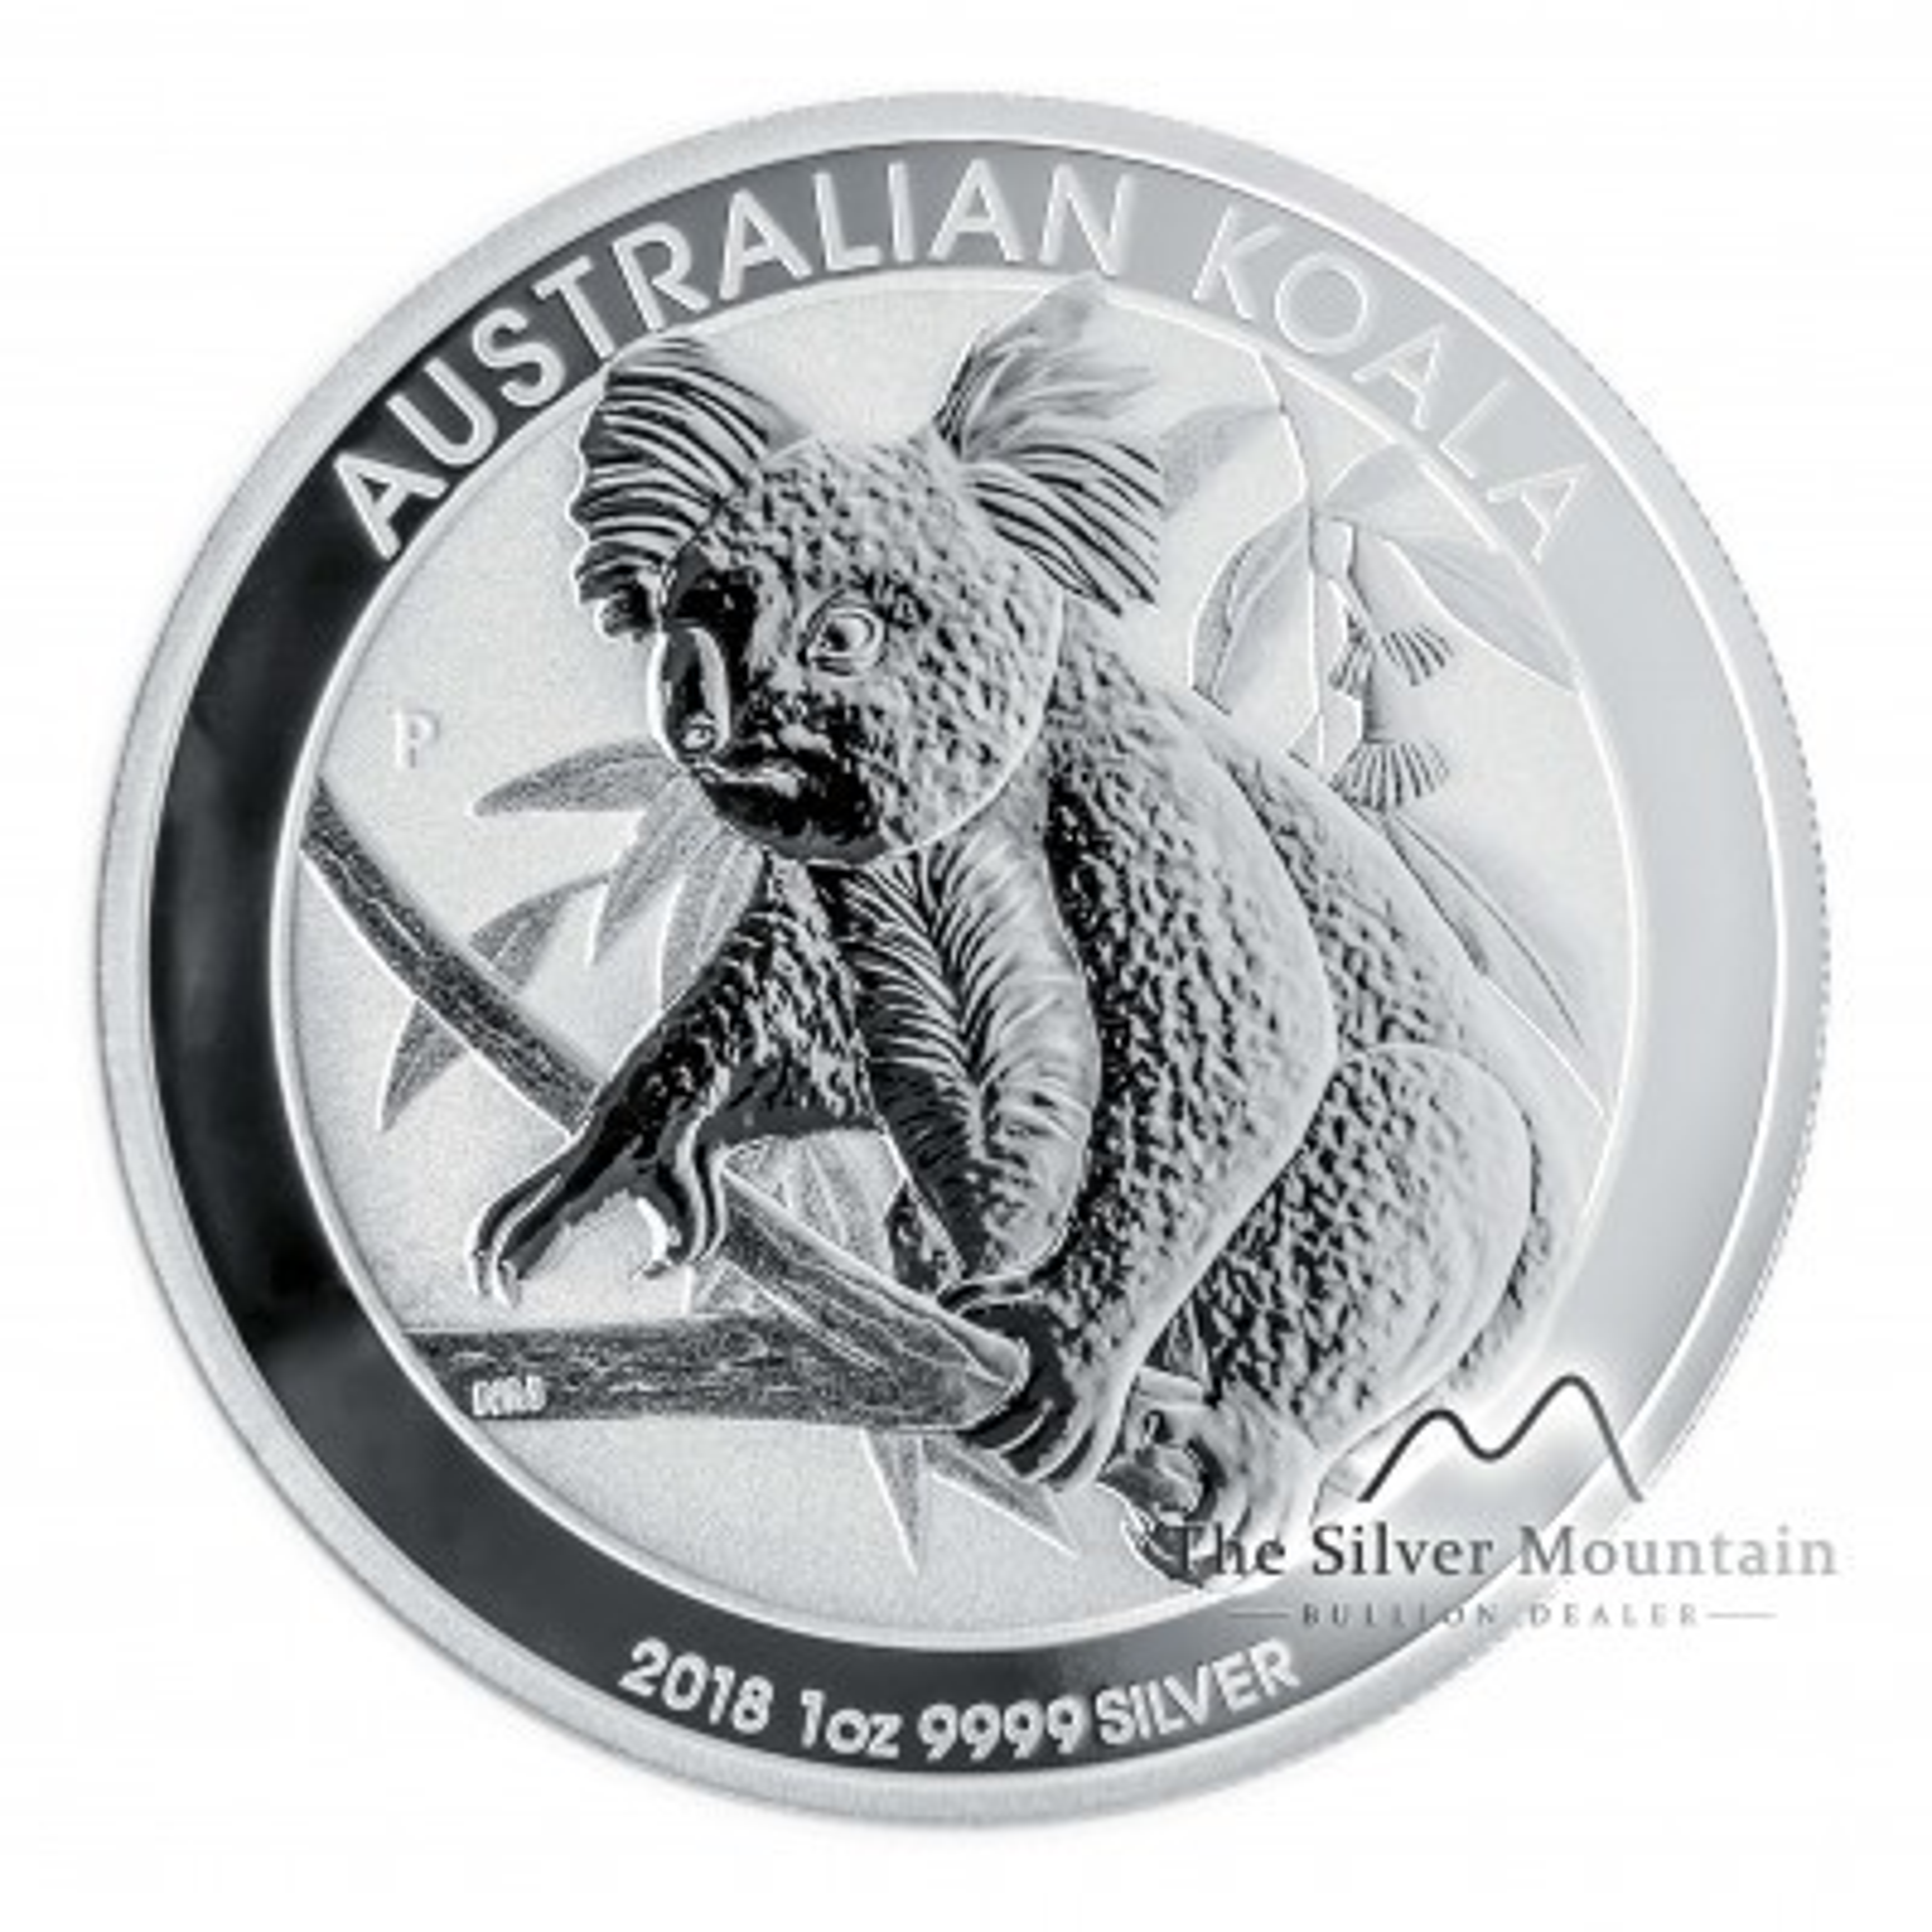 1 troy ounce silver Koala coin 2018